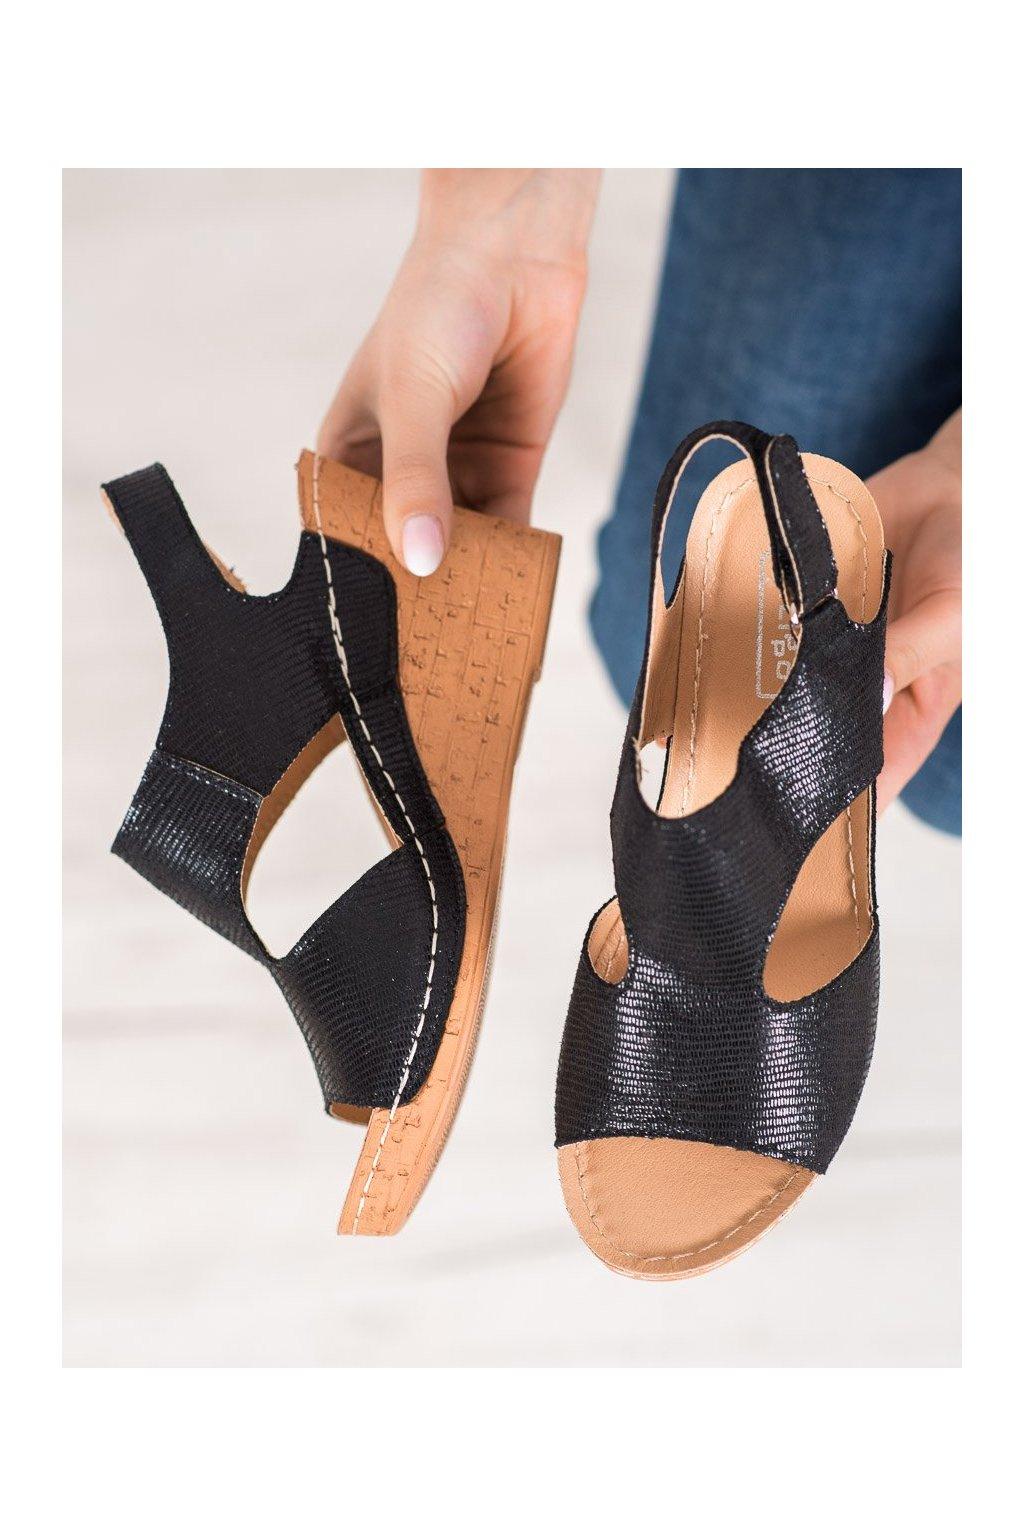 Čierne sandále Filippo kod DS785/19B